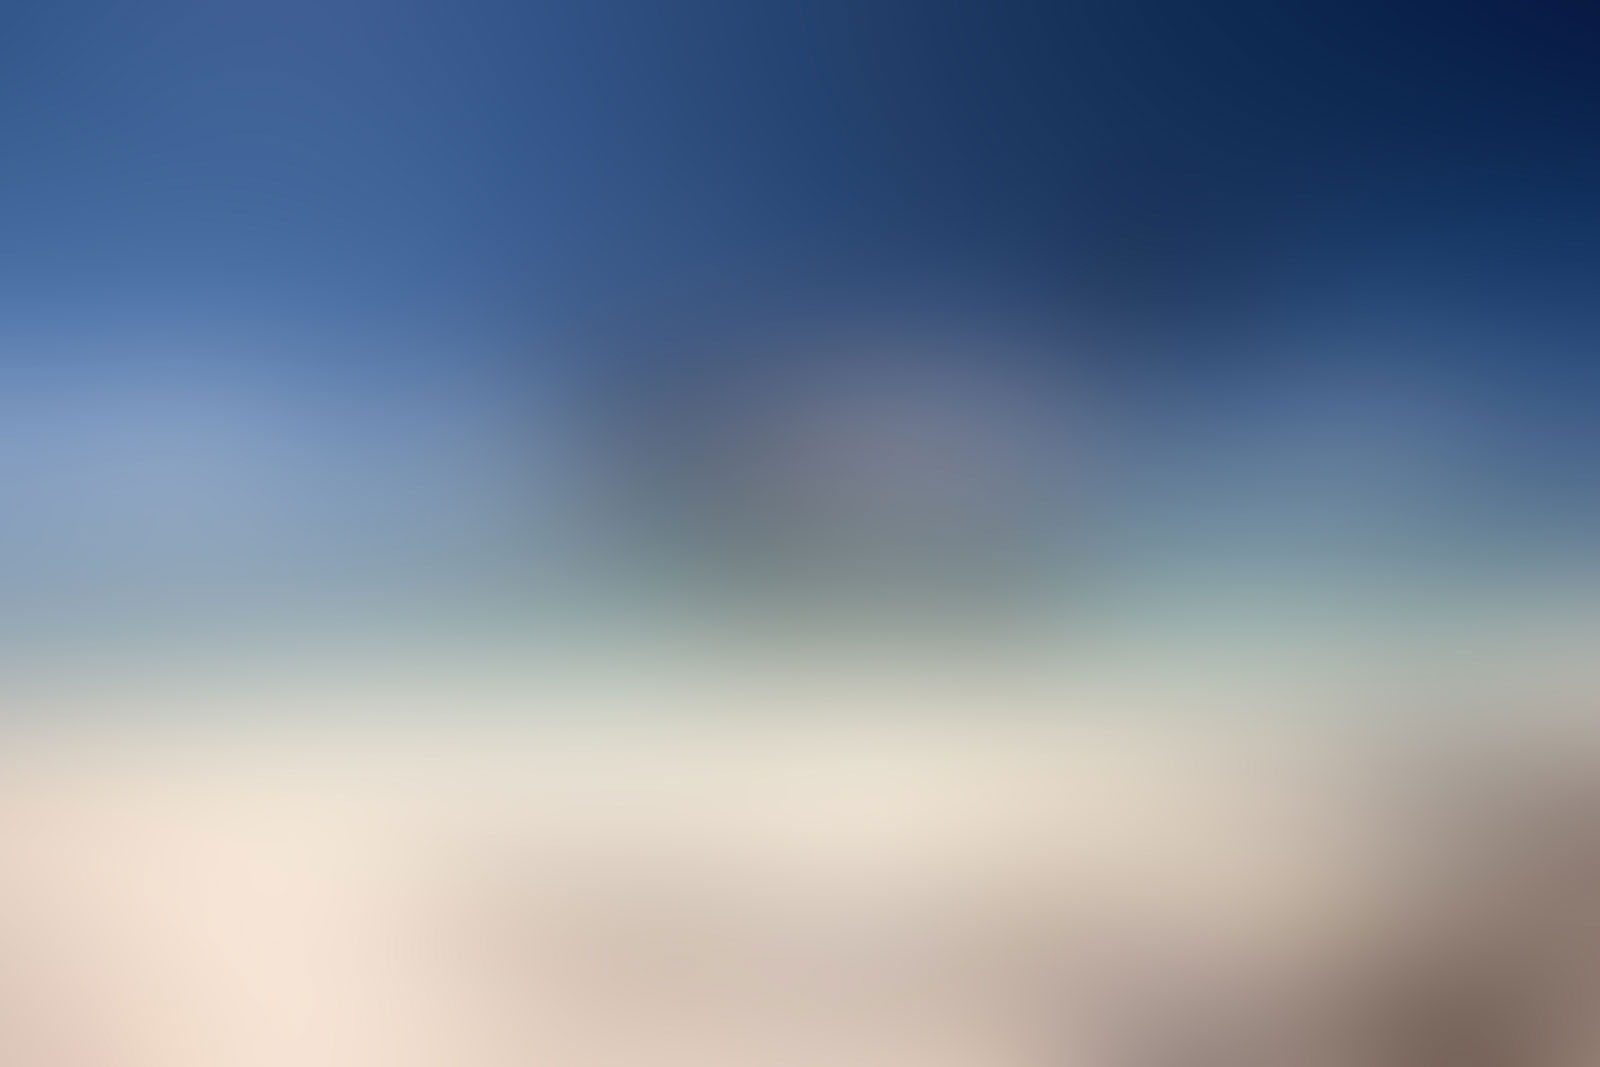 Blurred Background Blue Tan